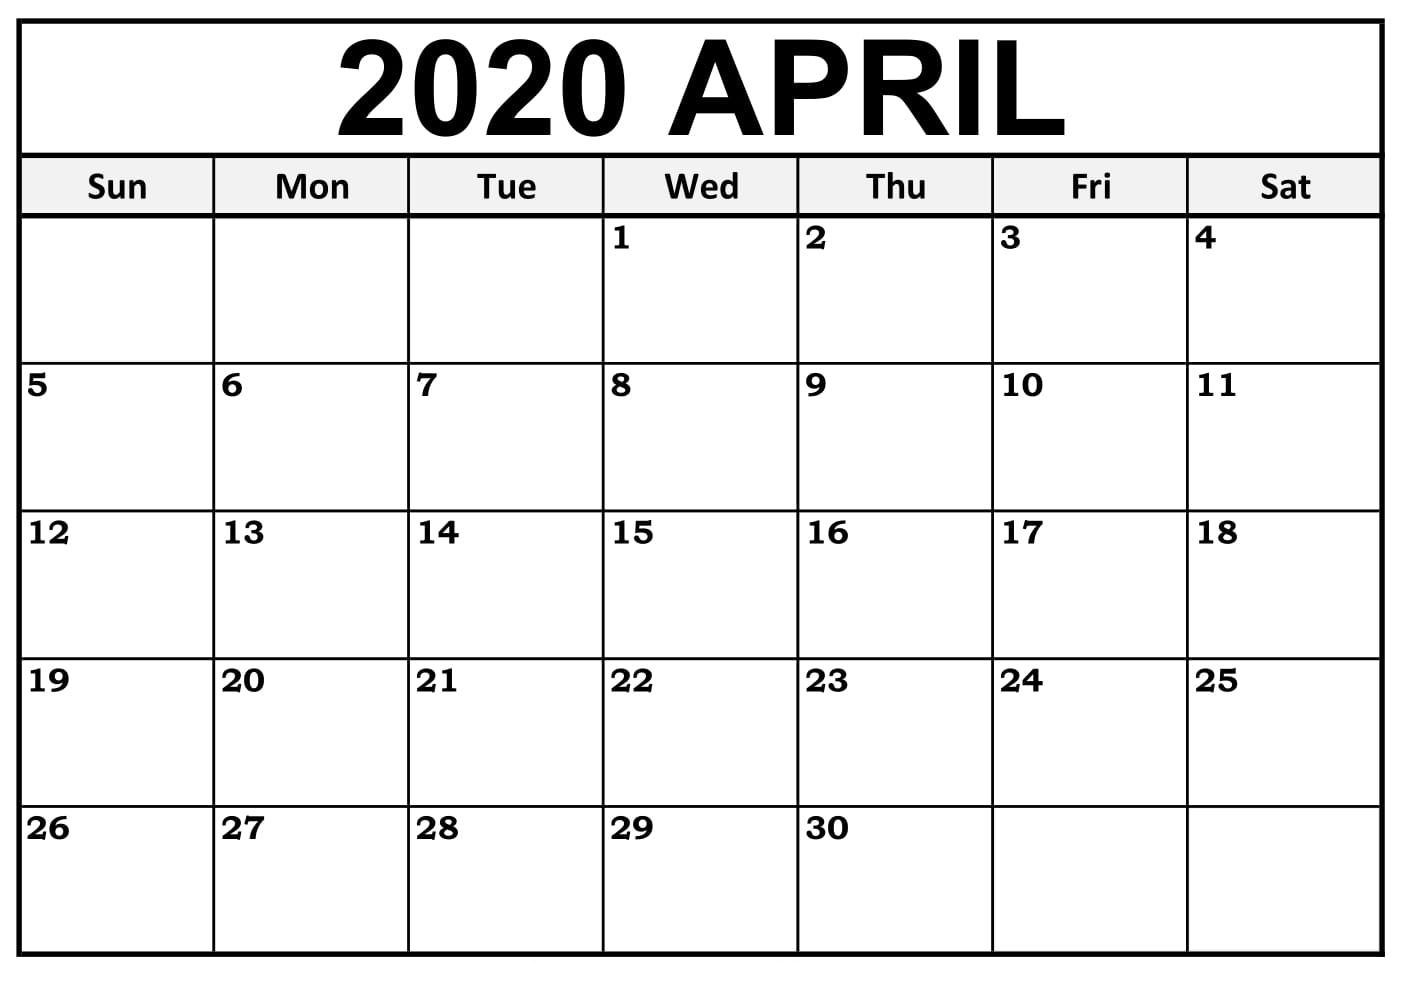 April 2020 Printable Calendar – Template Pdf, Word & Excel with regard to April 2020 Printable Calendar